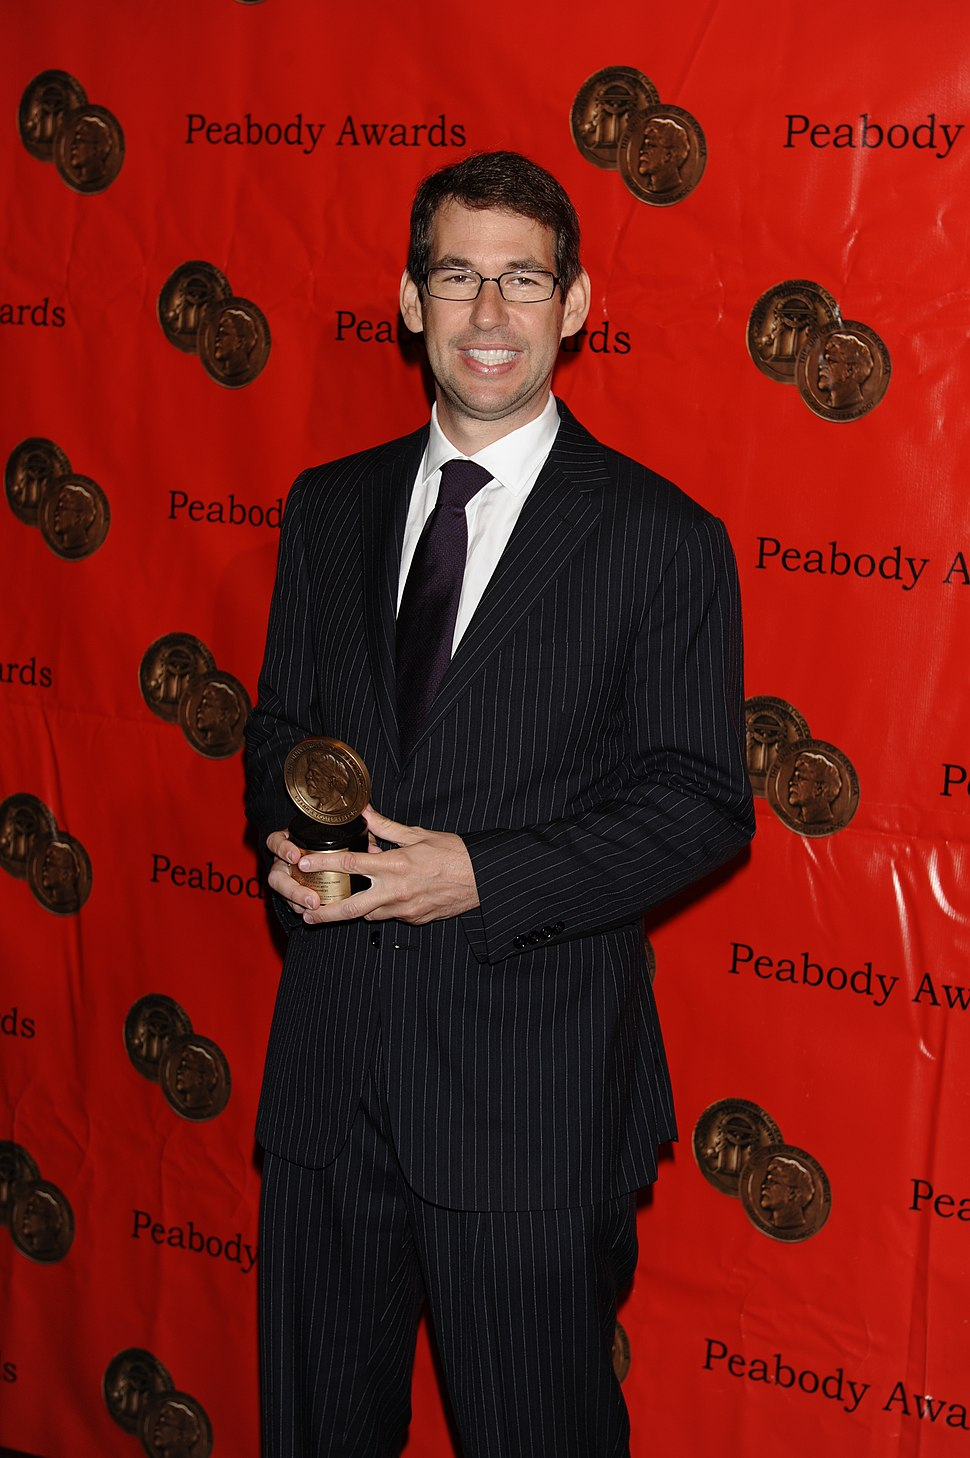 Doug Ellin at the 68th Annual Peabody Awards for Entourage